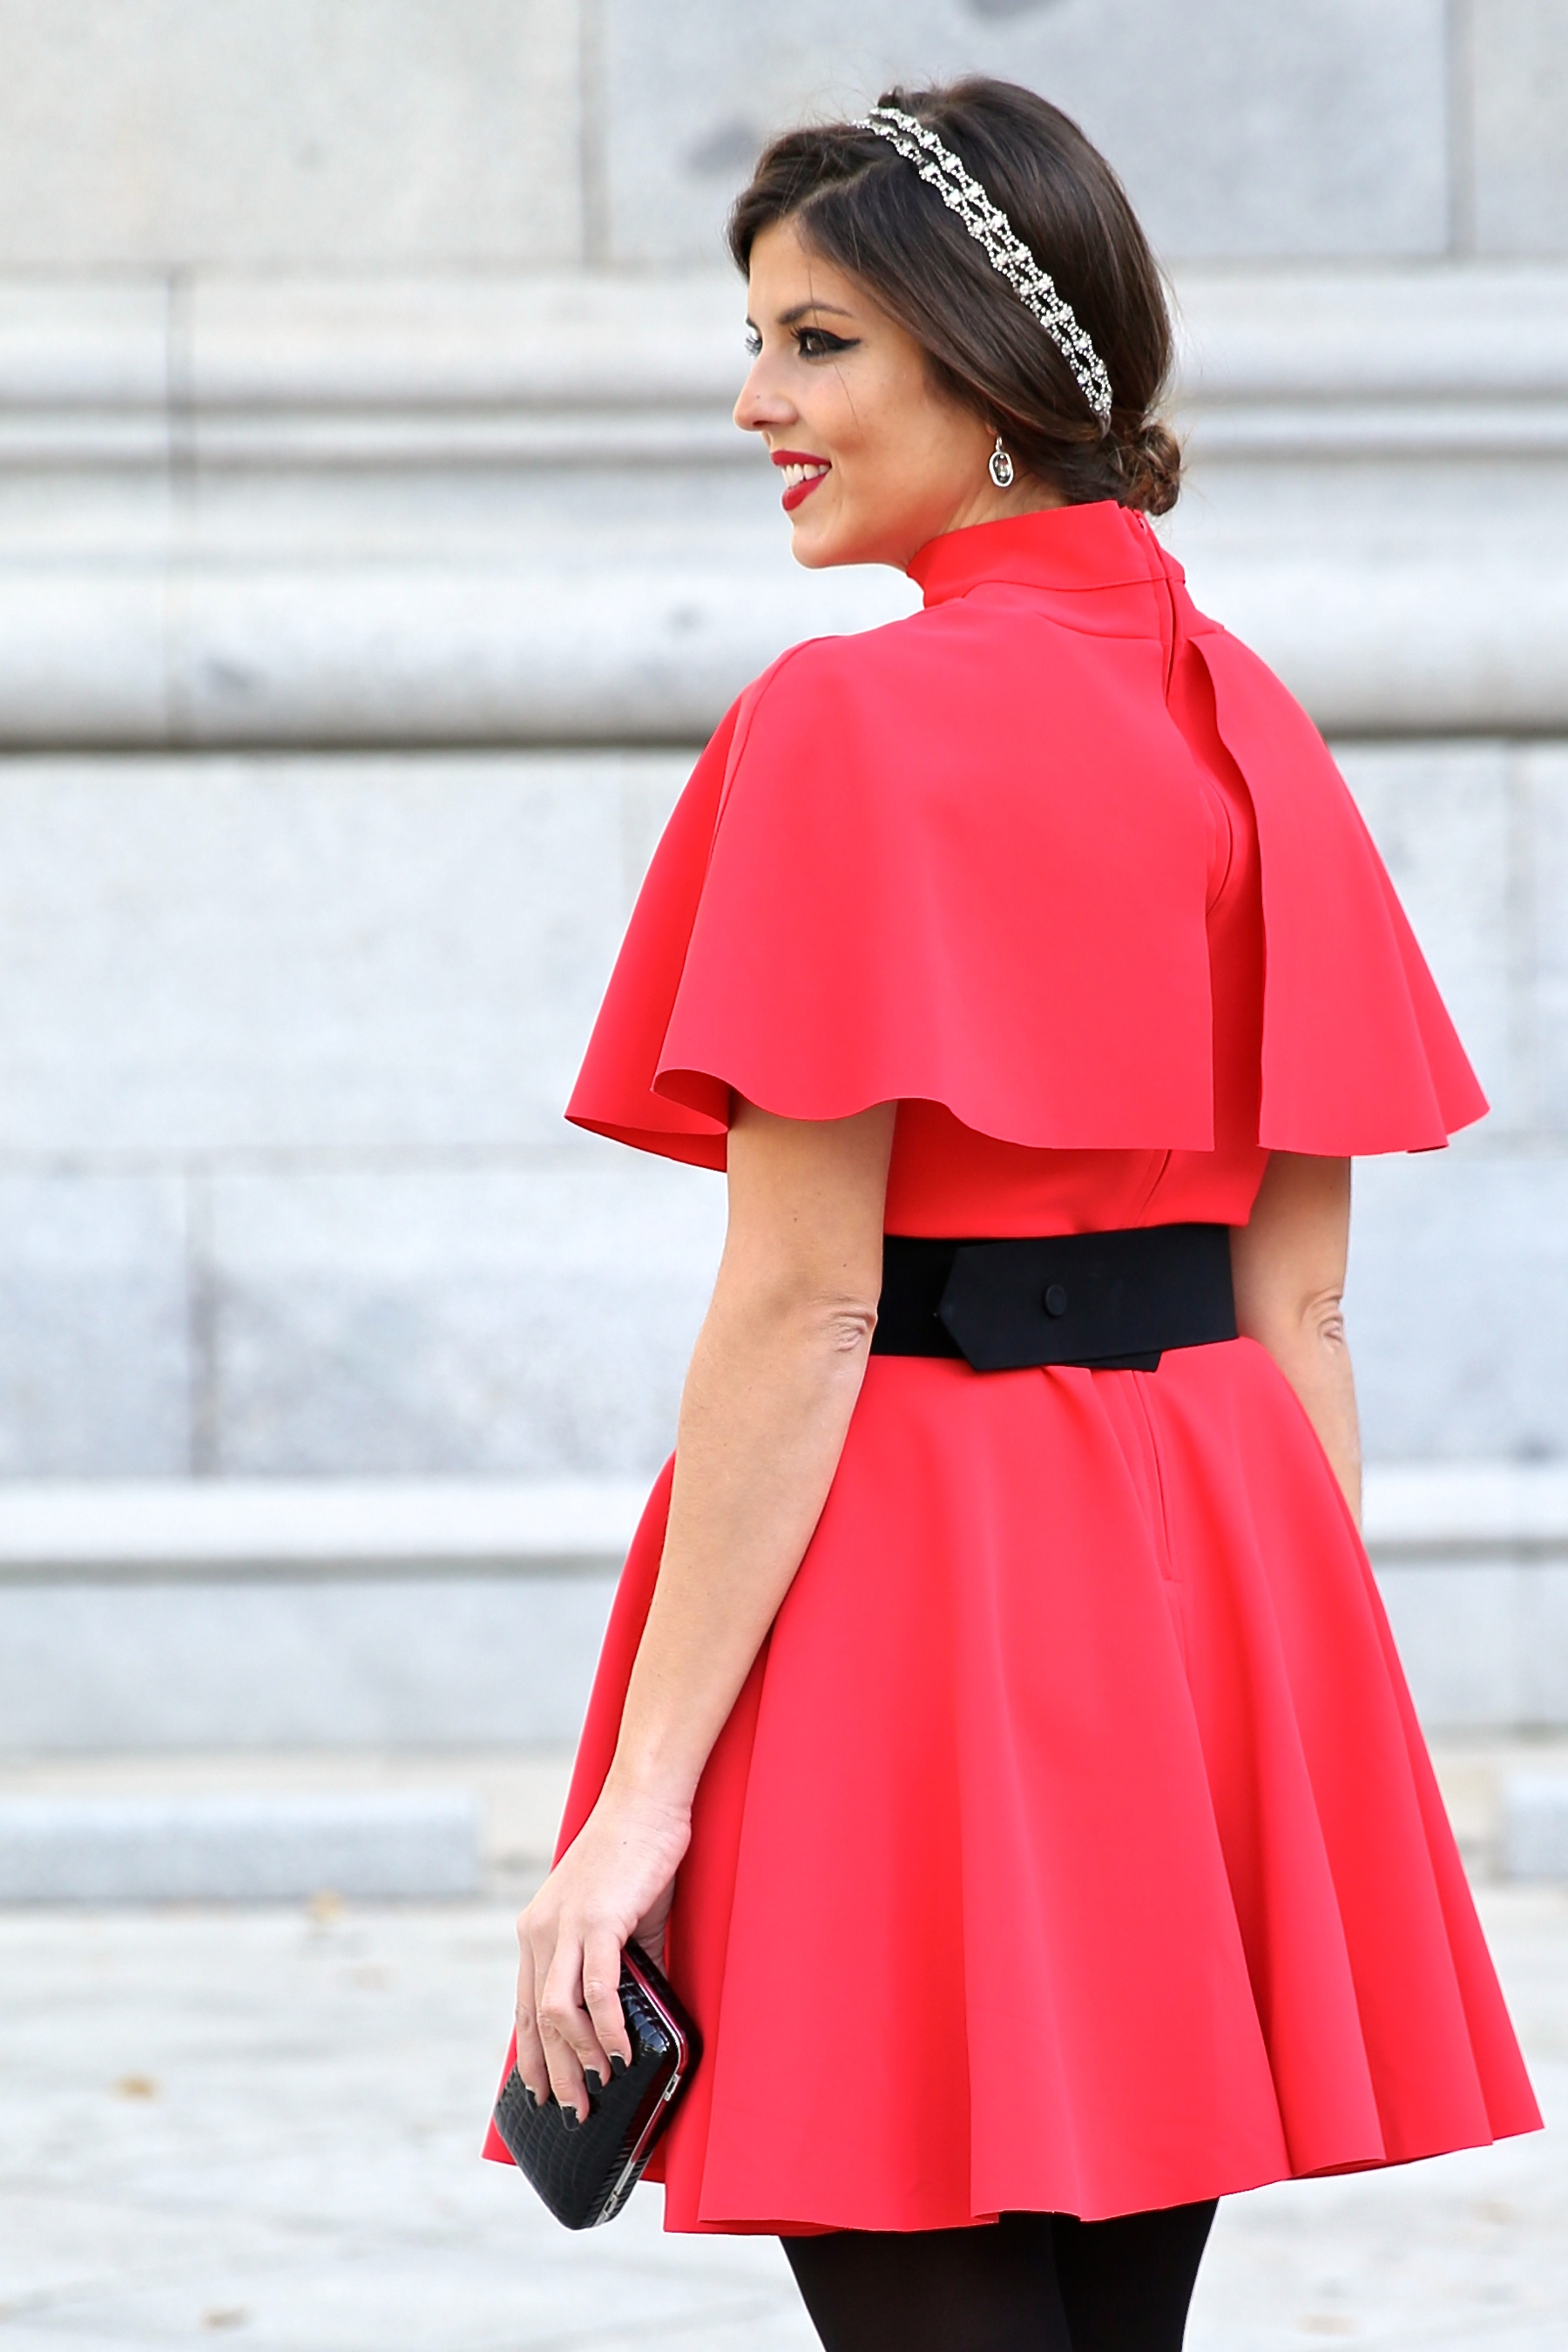 trendy_taste-look-outfit-street_style-ootd-blog-blogger-fashion_spain-moda_españa-vestido_fiesta-24fab-13